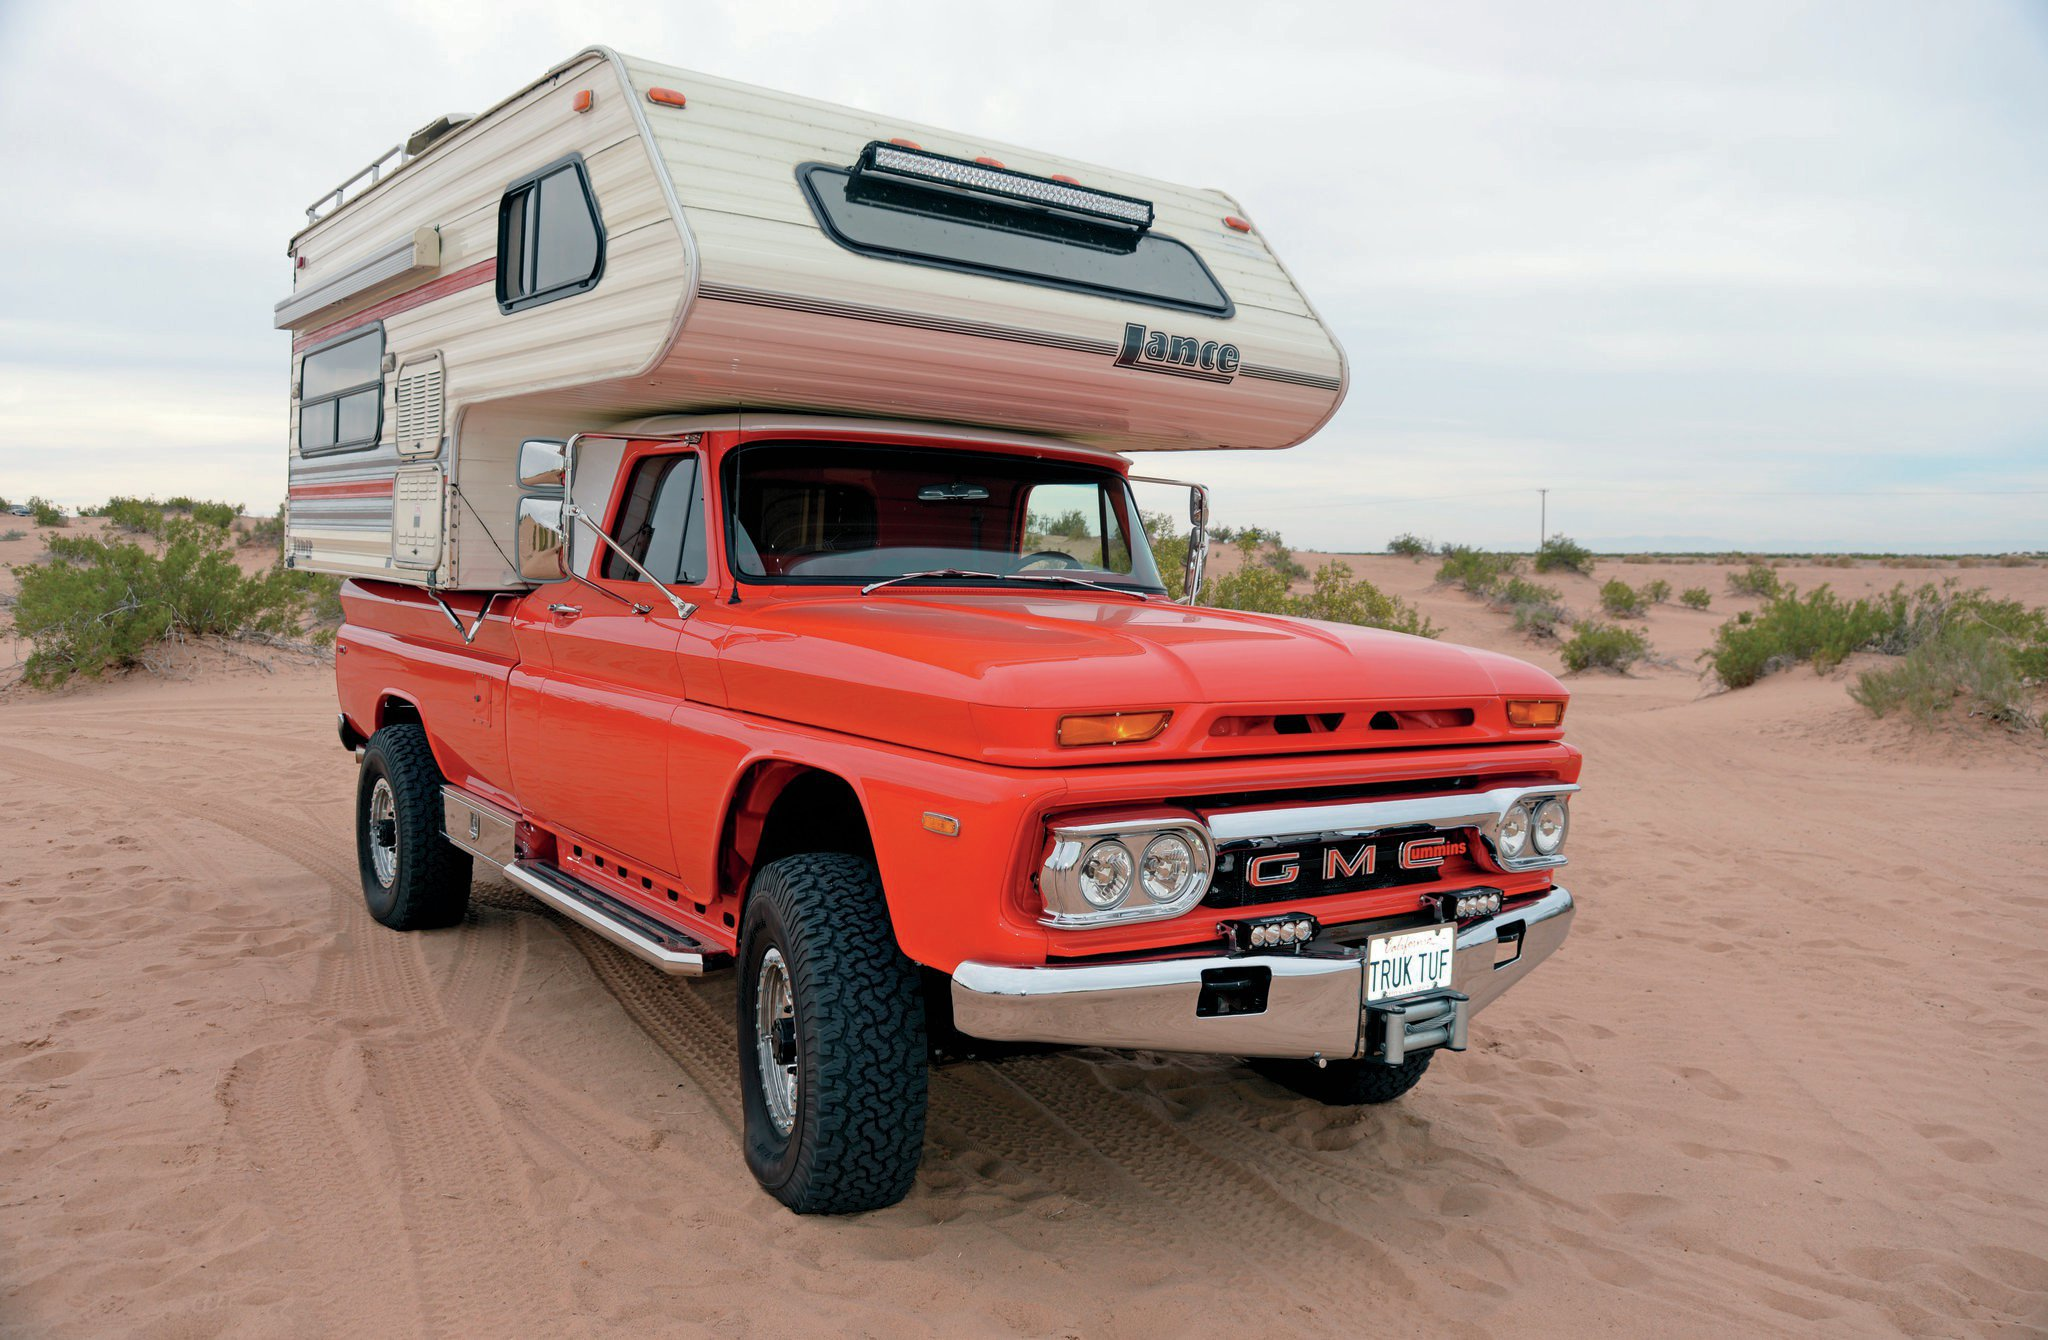 Cummins Powered 1966 Gmc Camper Truck Photo Image Gallery